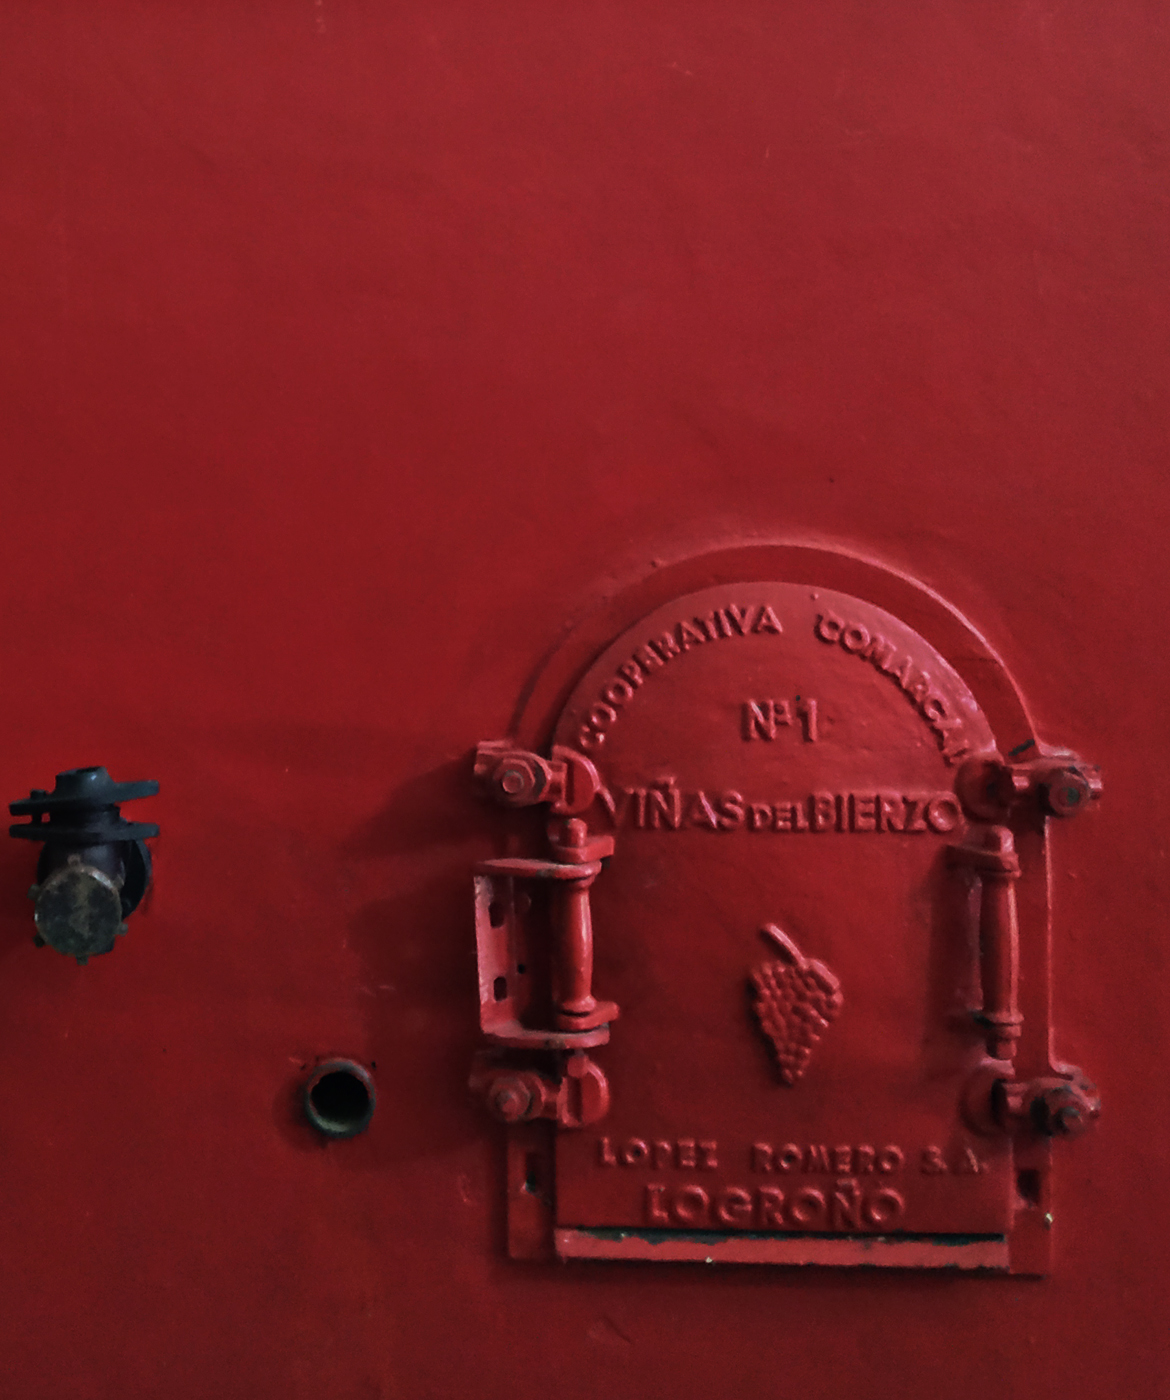 deposito-puerta-granbierzo